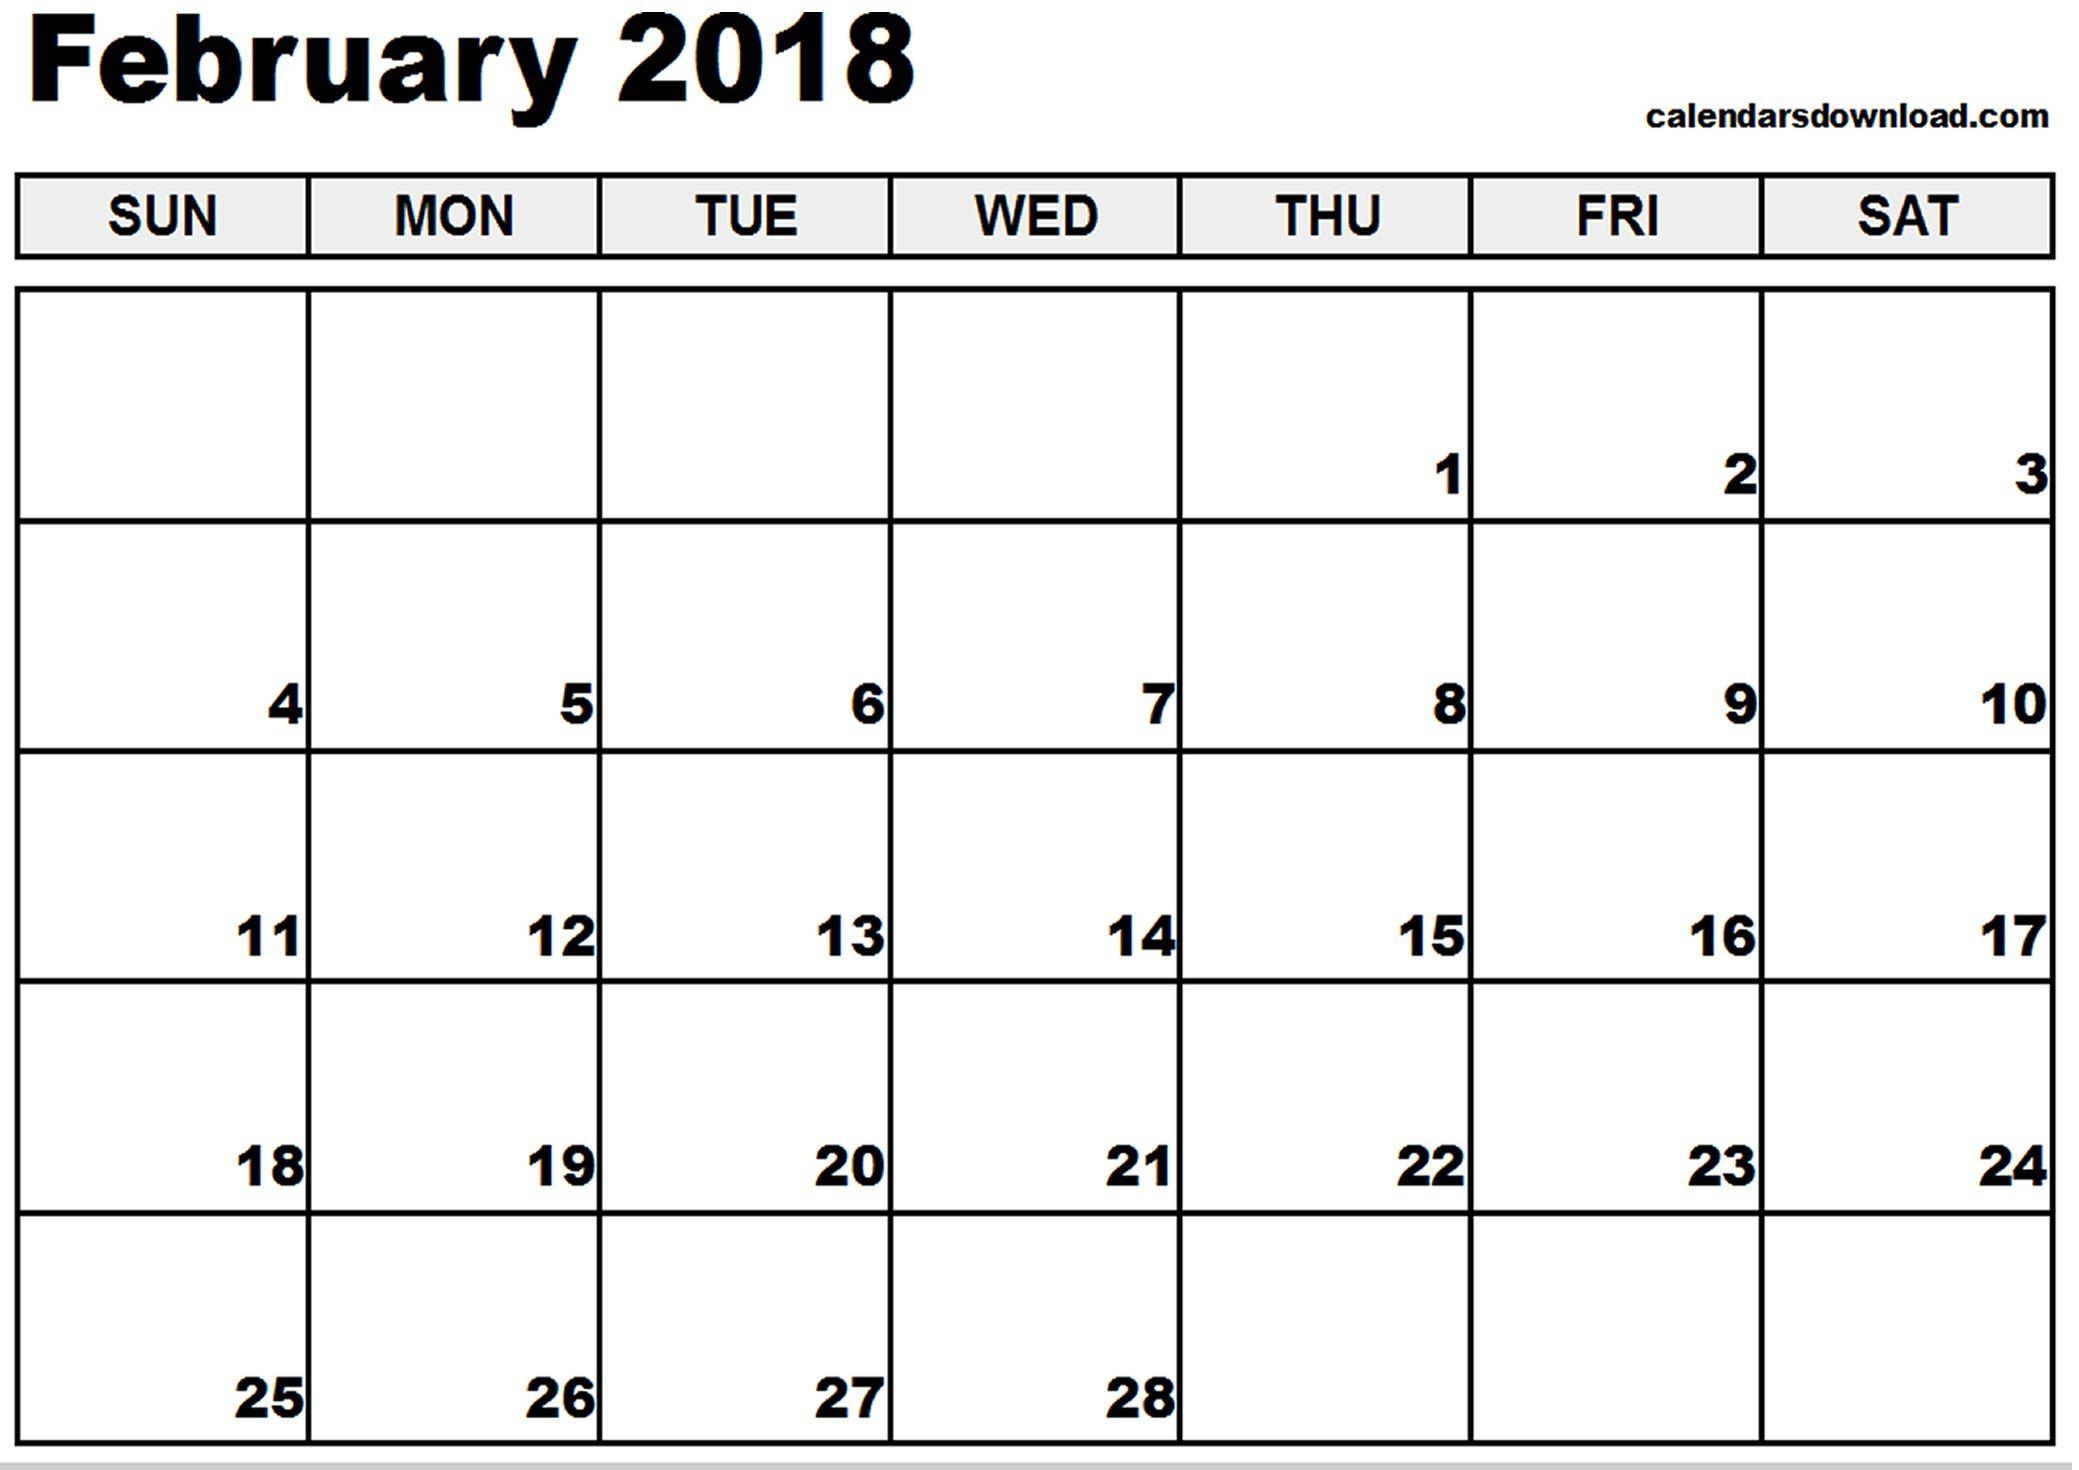 Calendaroffice Wp Content Uploads 10